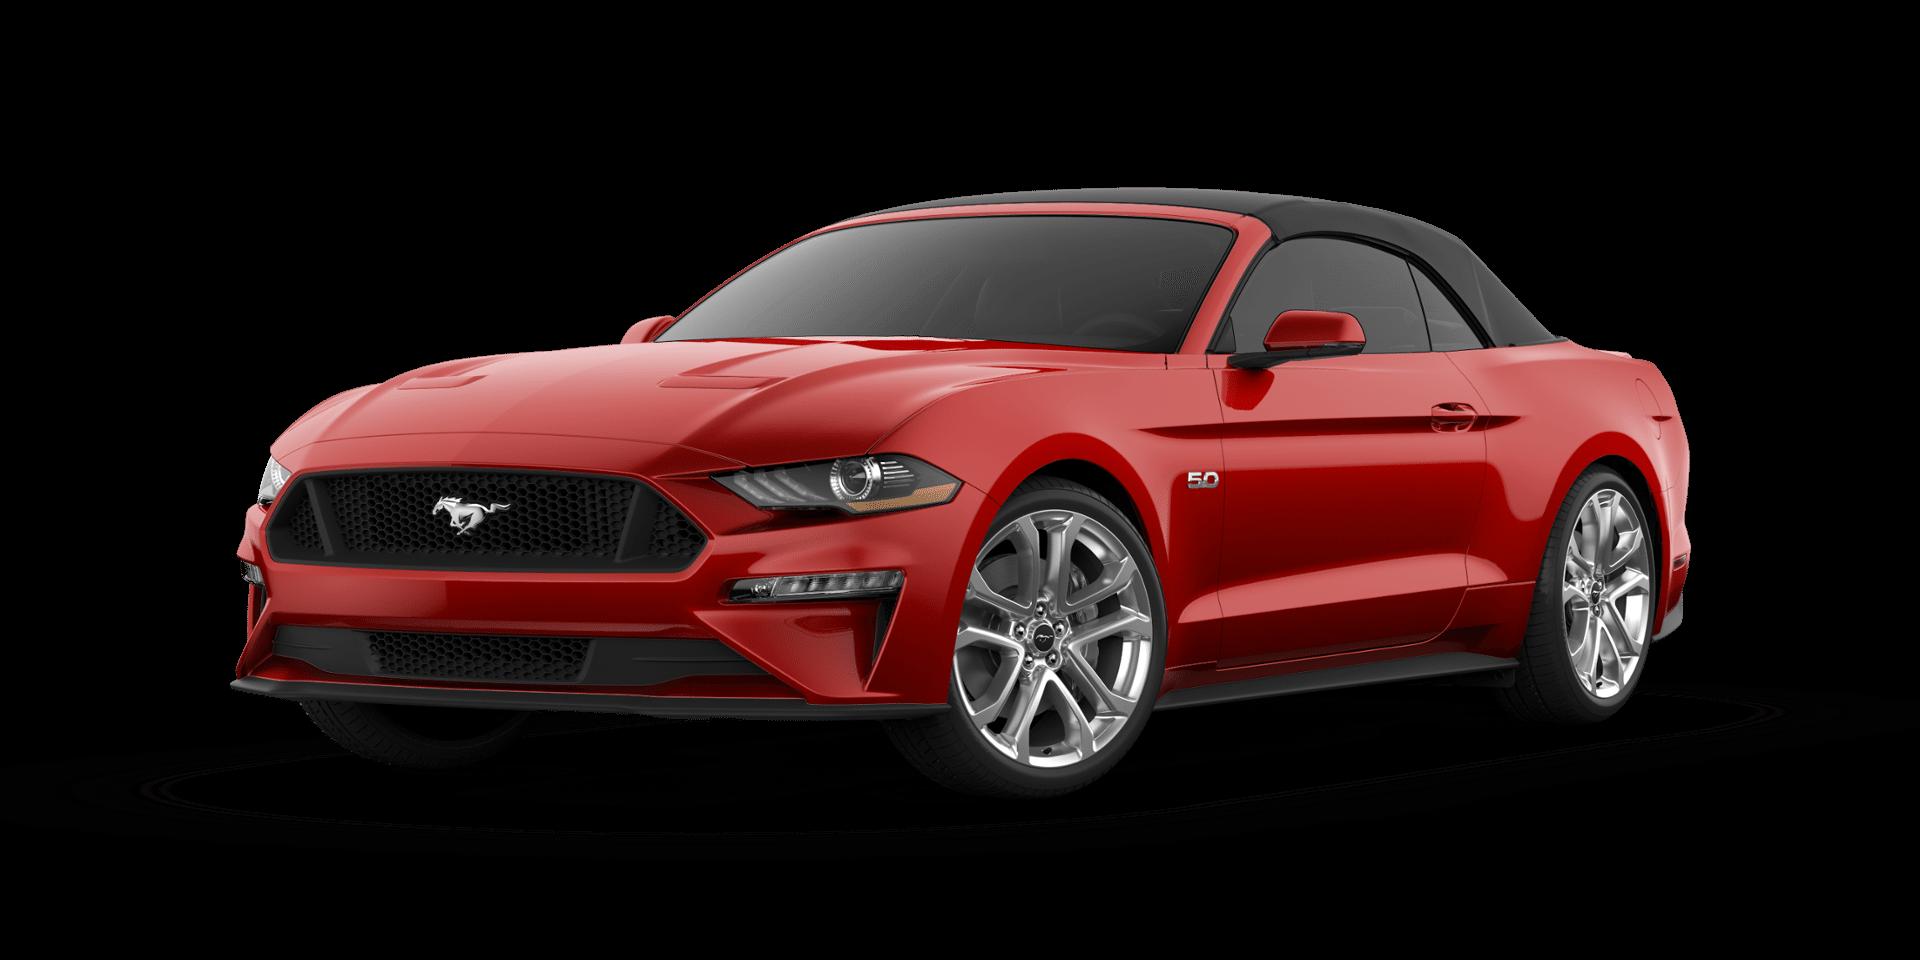 2018 Mustang Ford Mustang